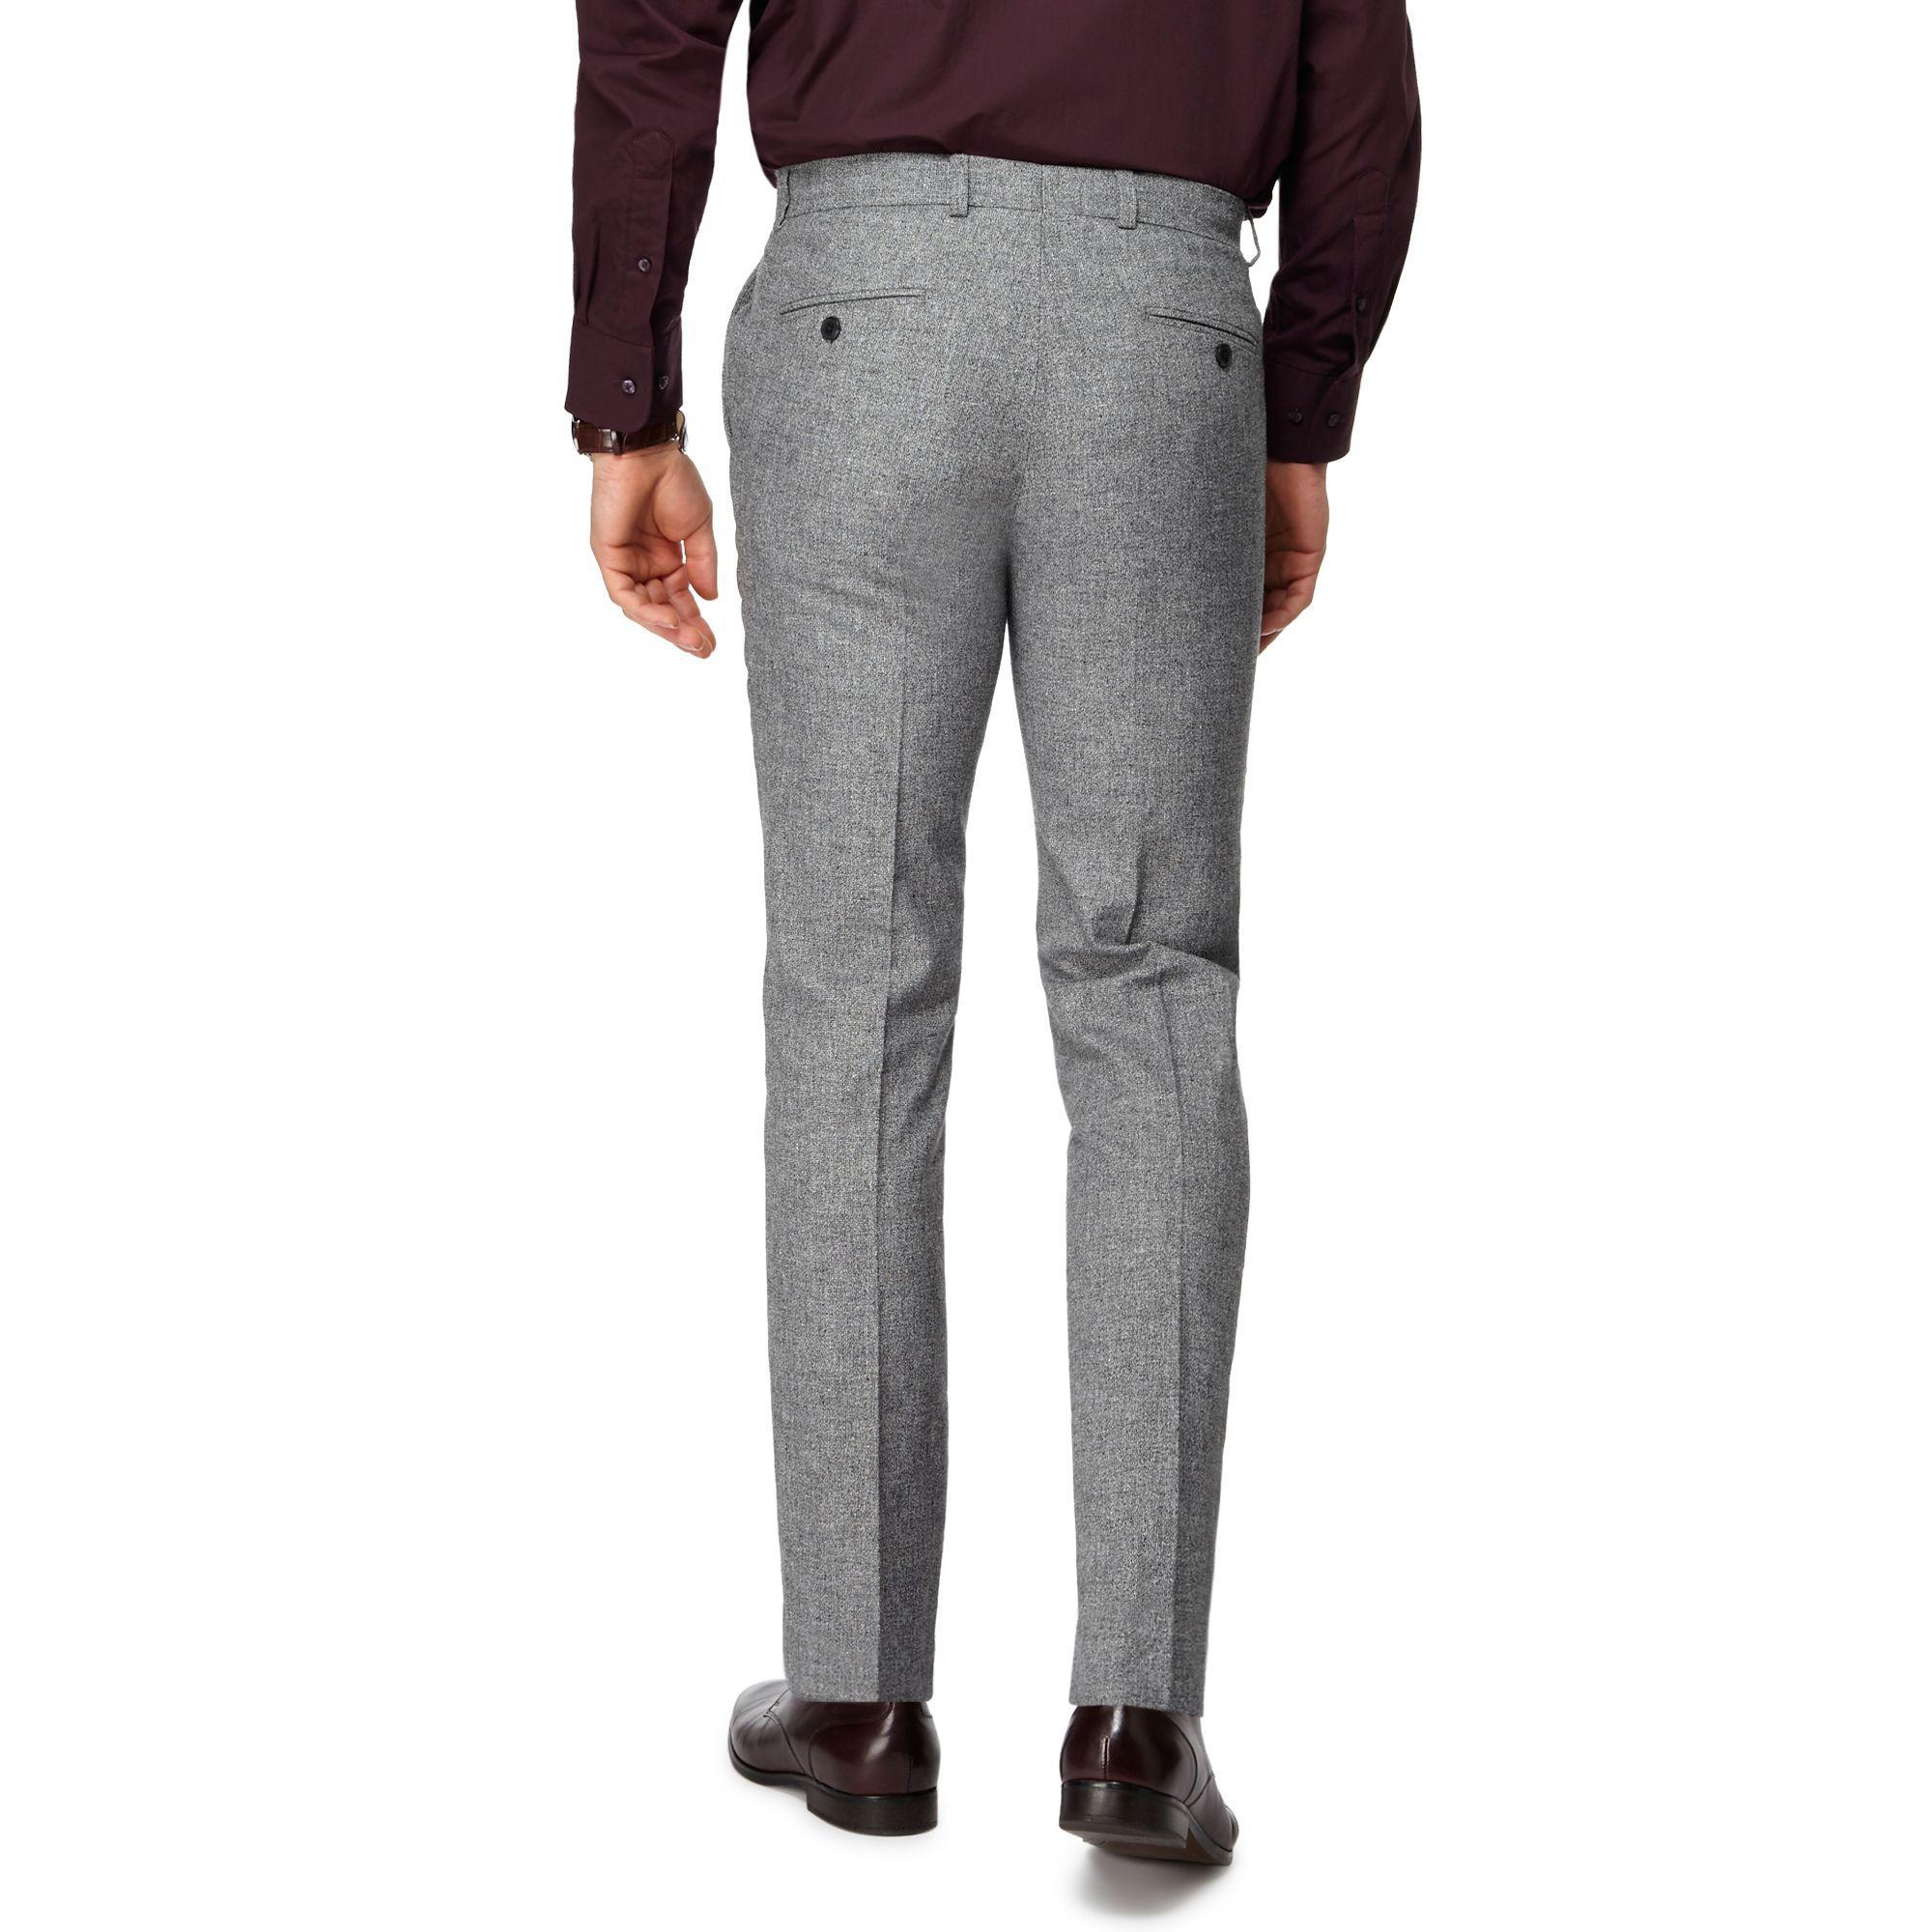 J By Jasper Conran Cotton Grey Smart Trousers in Grey for Men